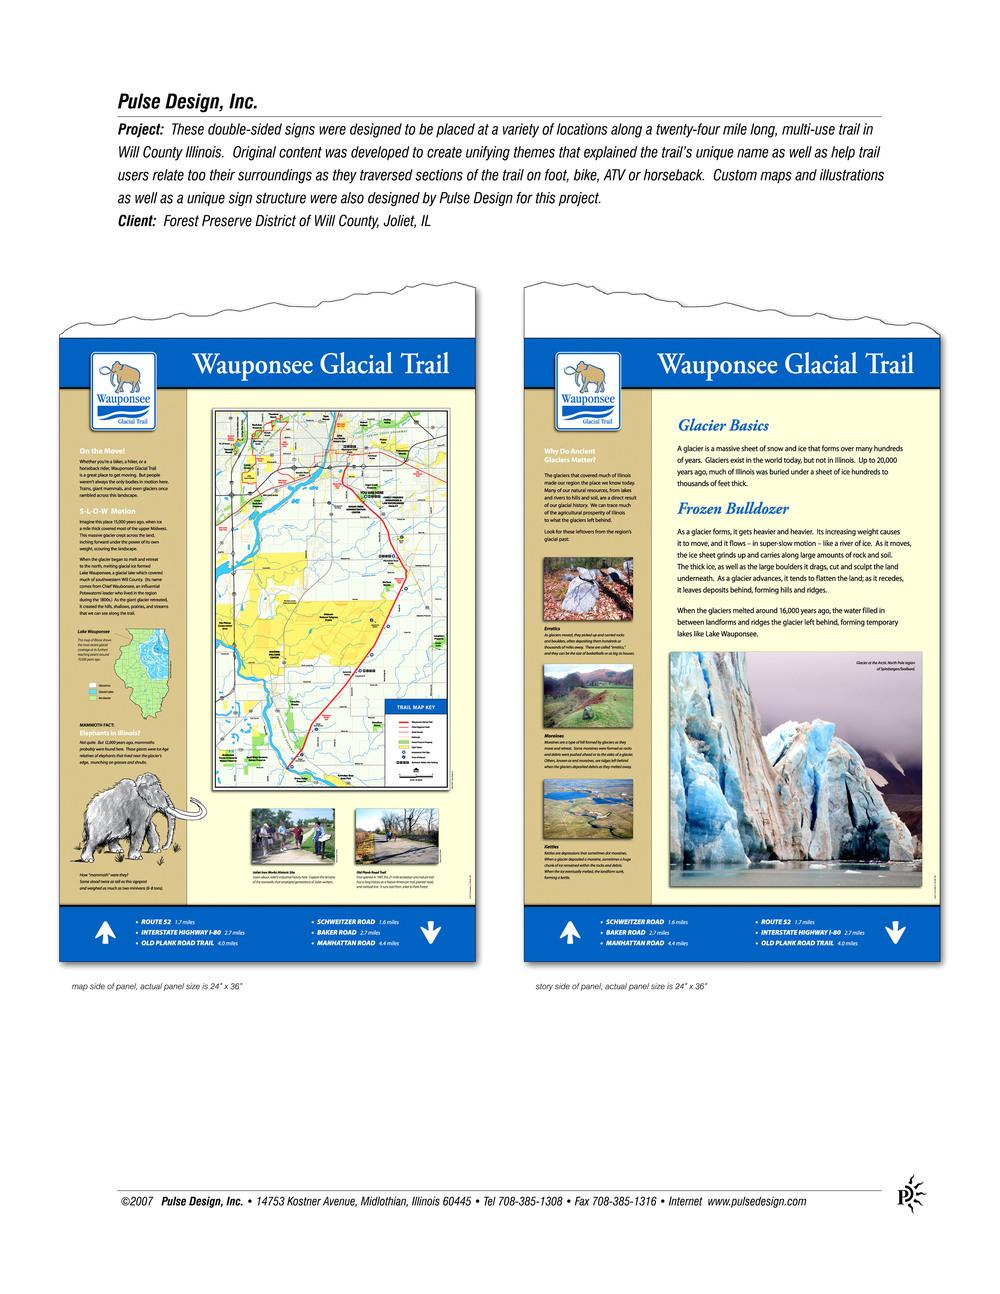 Wauponsee-Glacial-Trail-Signs-Lg-1-Pulse-Design-Inc.jpg